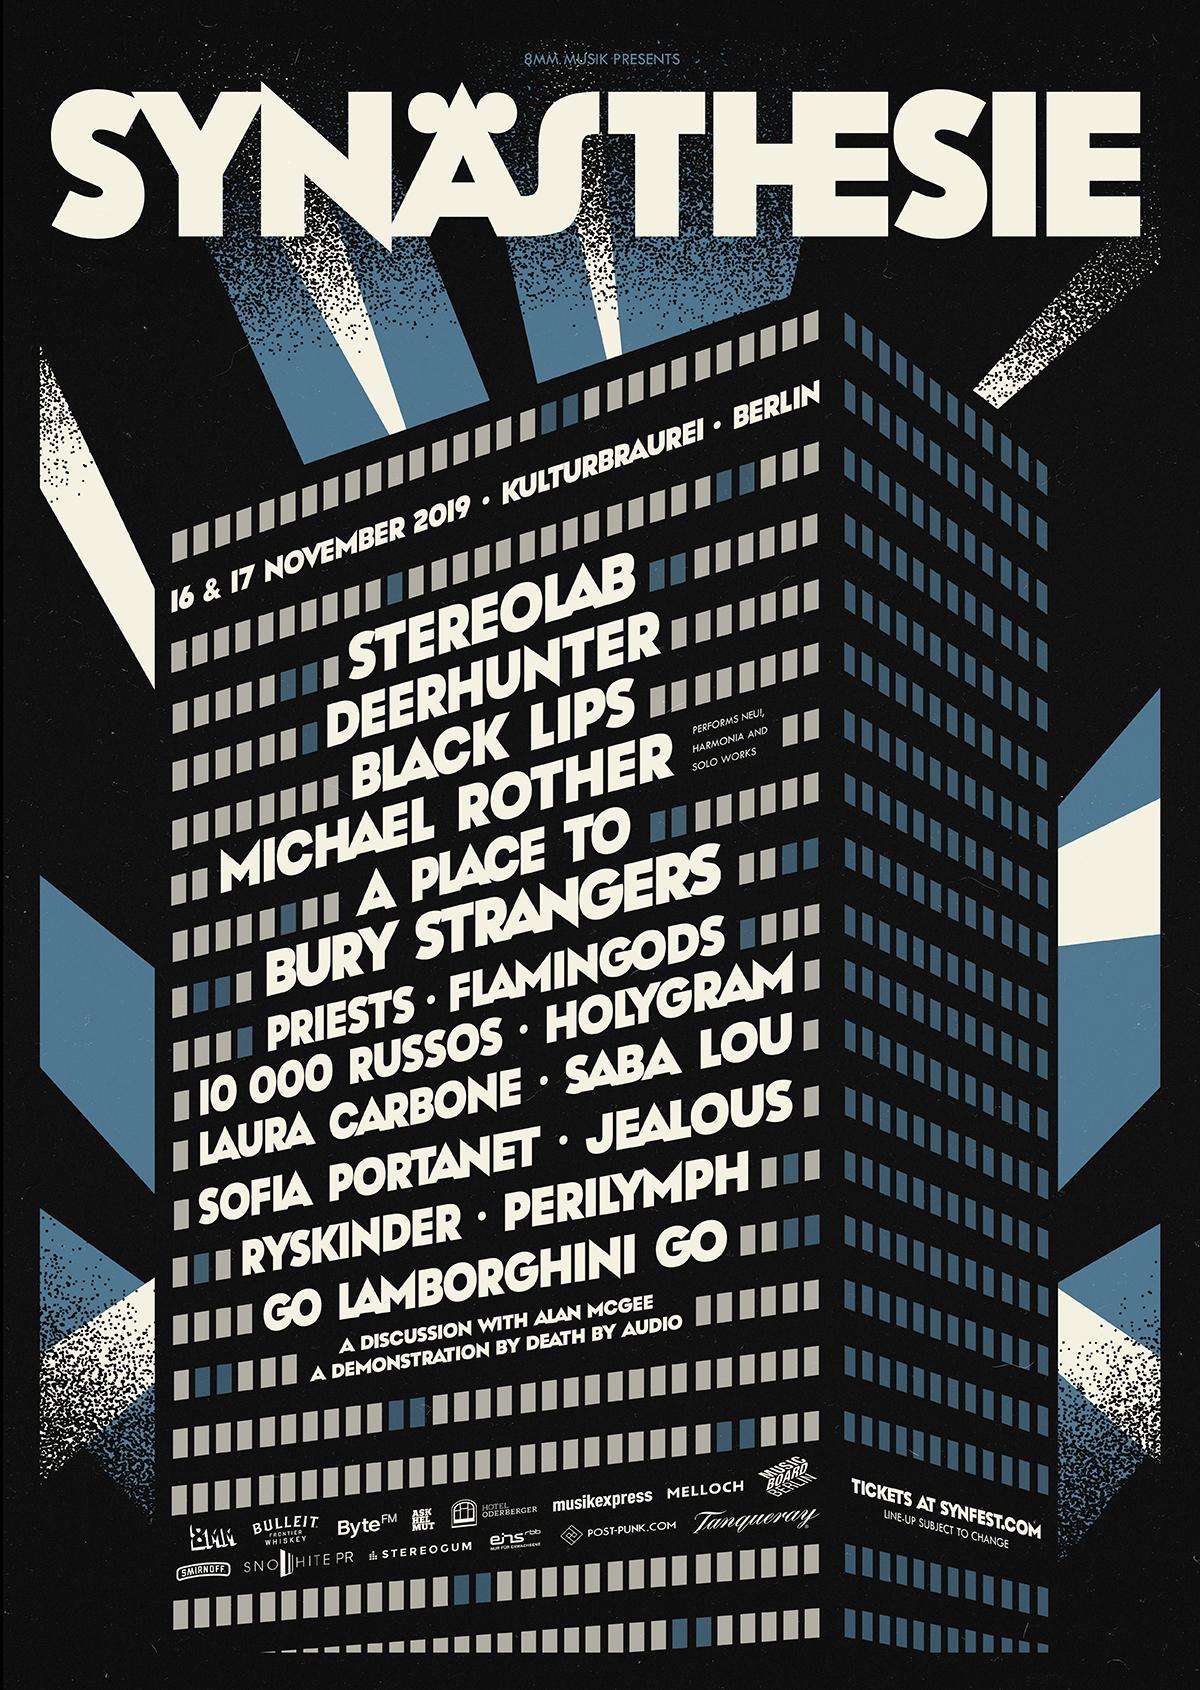 Festival – Festival Synästhesie 2019 – Berlin